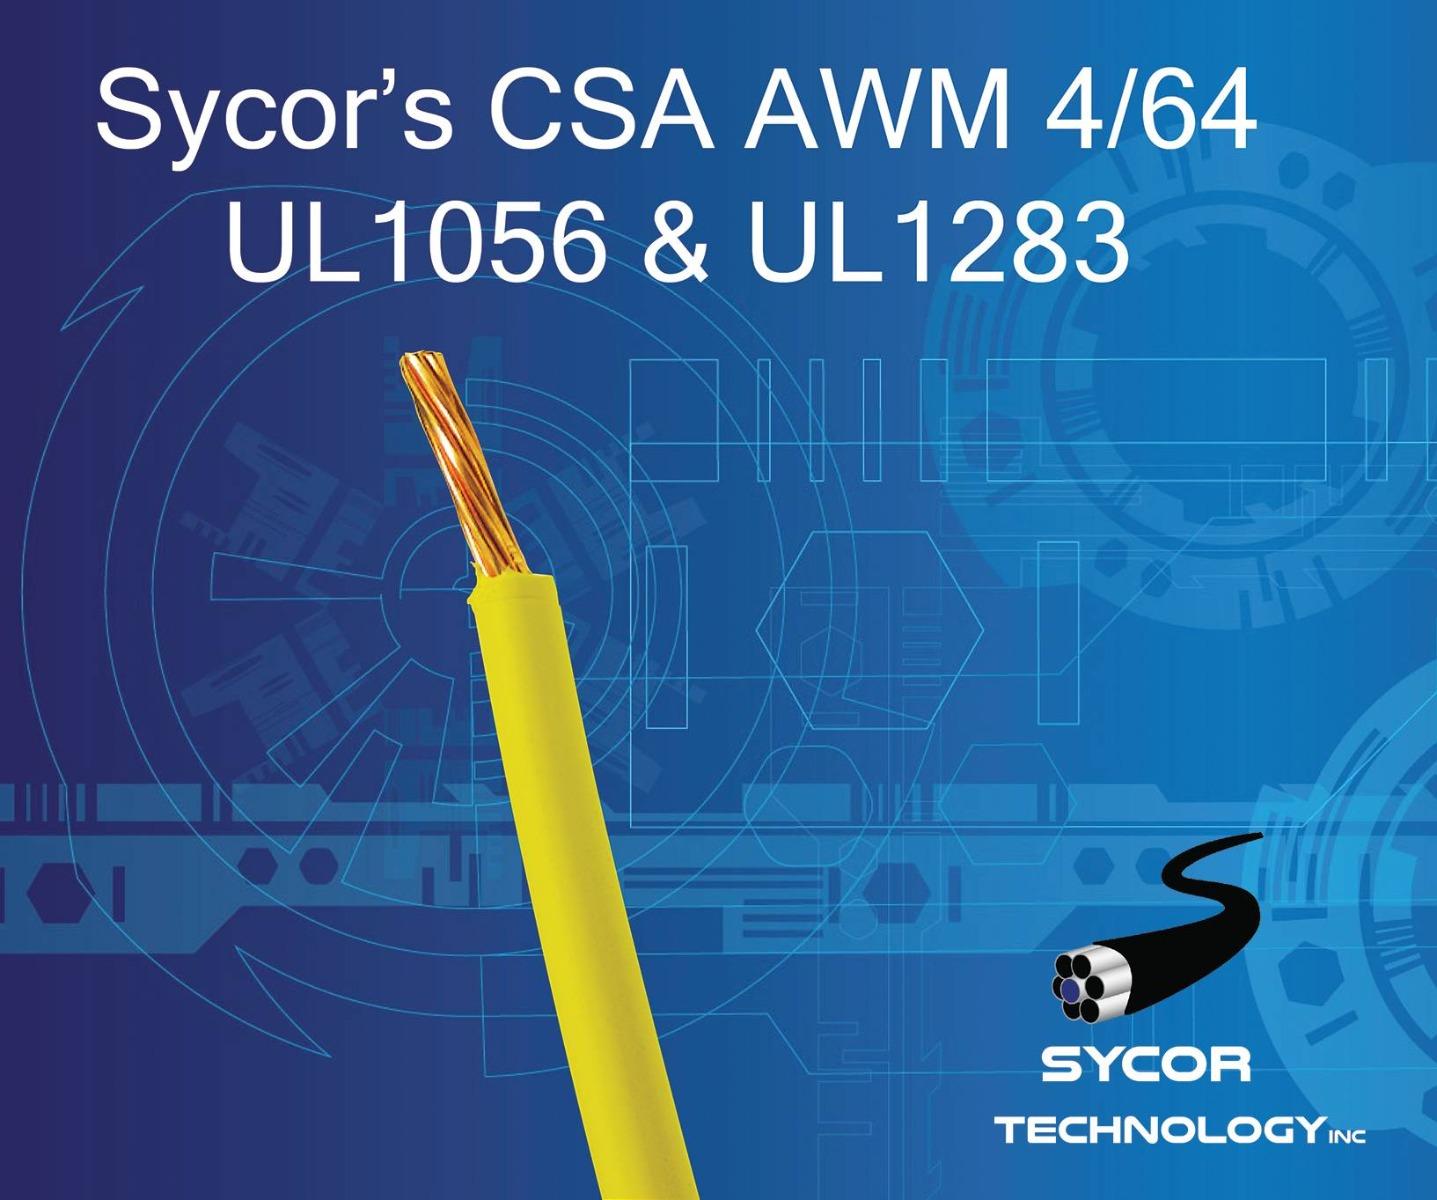 CSA AWM 4/64 UL1056, UL1283, Hook-Up Wire